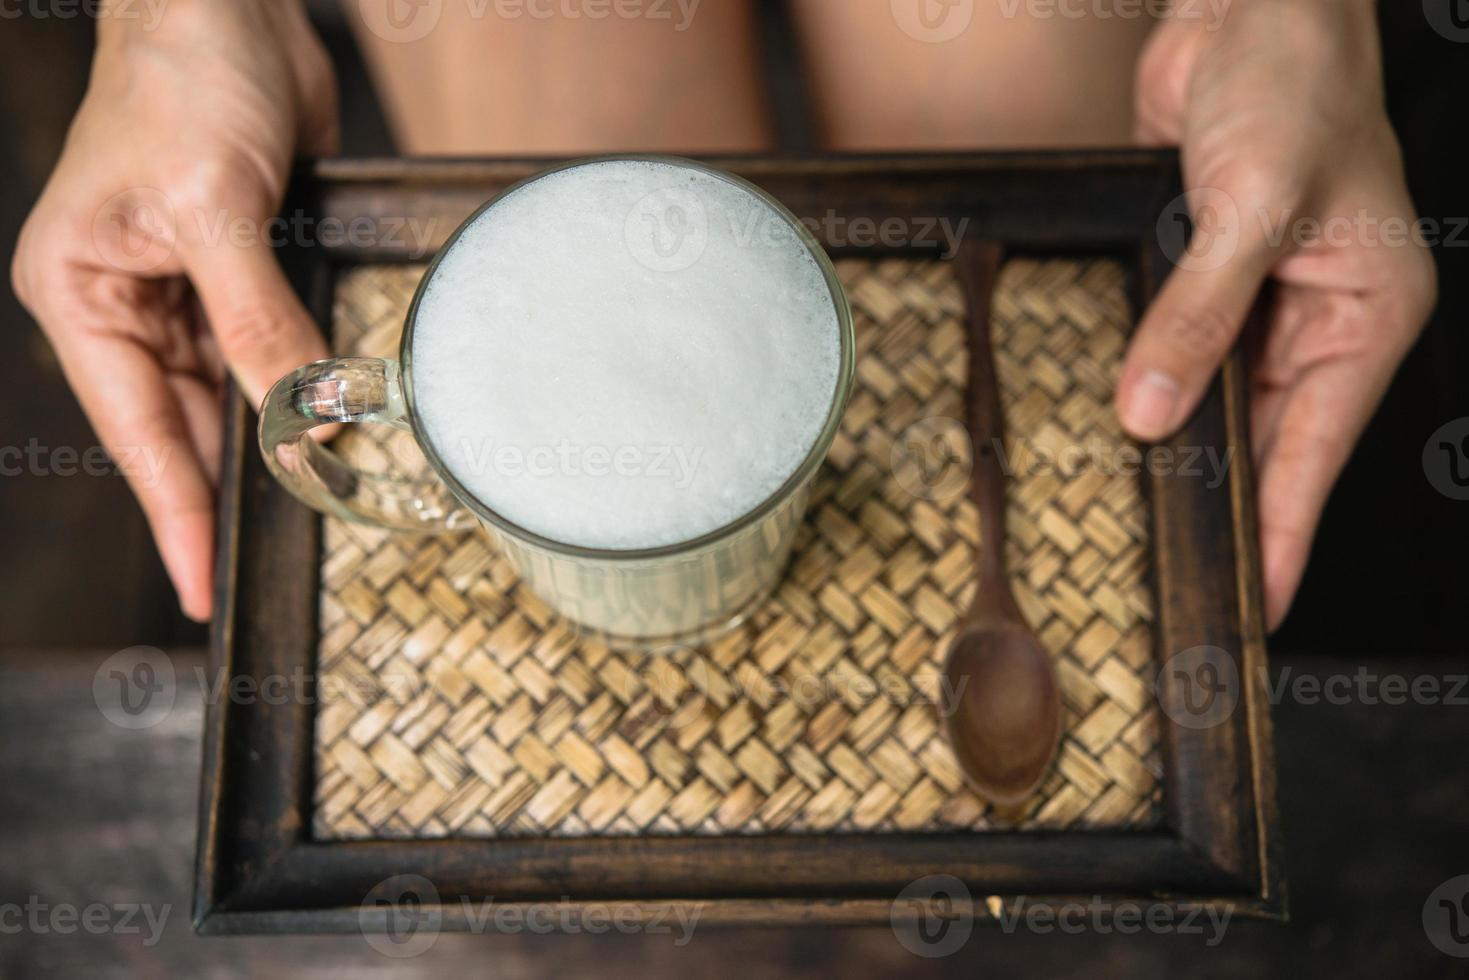 mujer sosteniendo un vaso de leche caliente relajarse foto